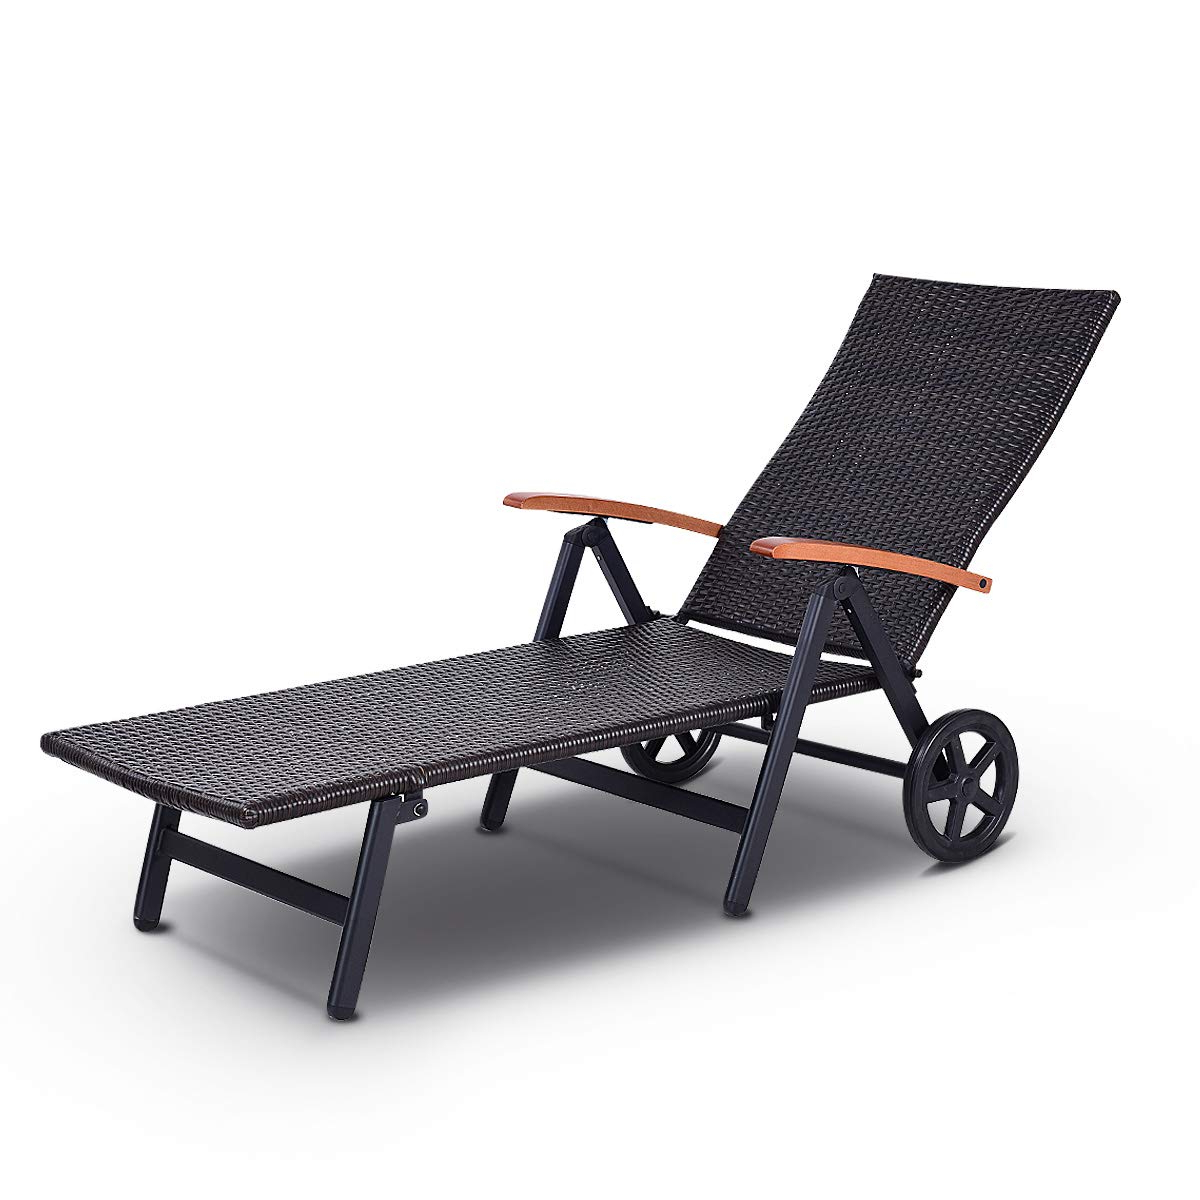 Kauai Outdoor Wicker Chaise Lounges Regarding Newest Einnehmend Tangkula Wicker Chaise Lounge Chair Cushion (View 12 of 25)